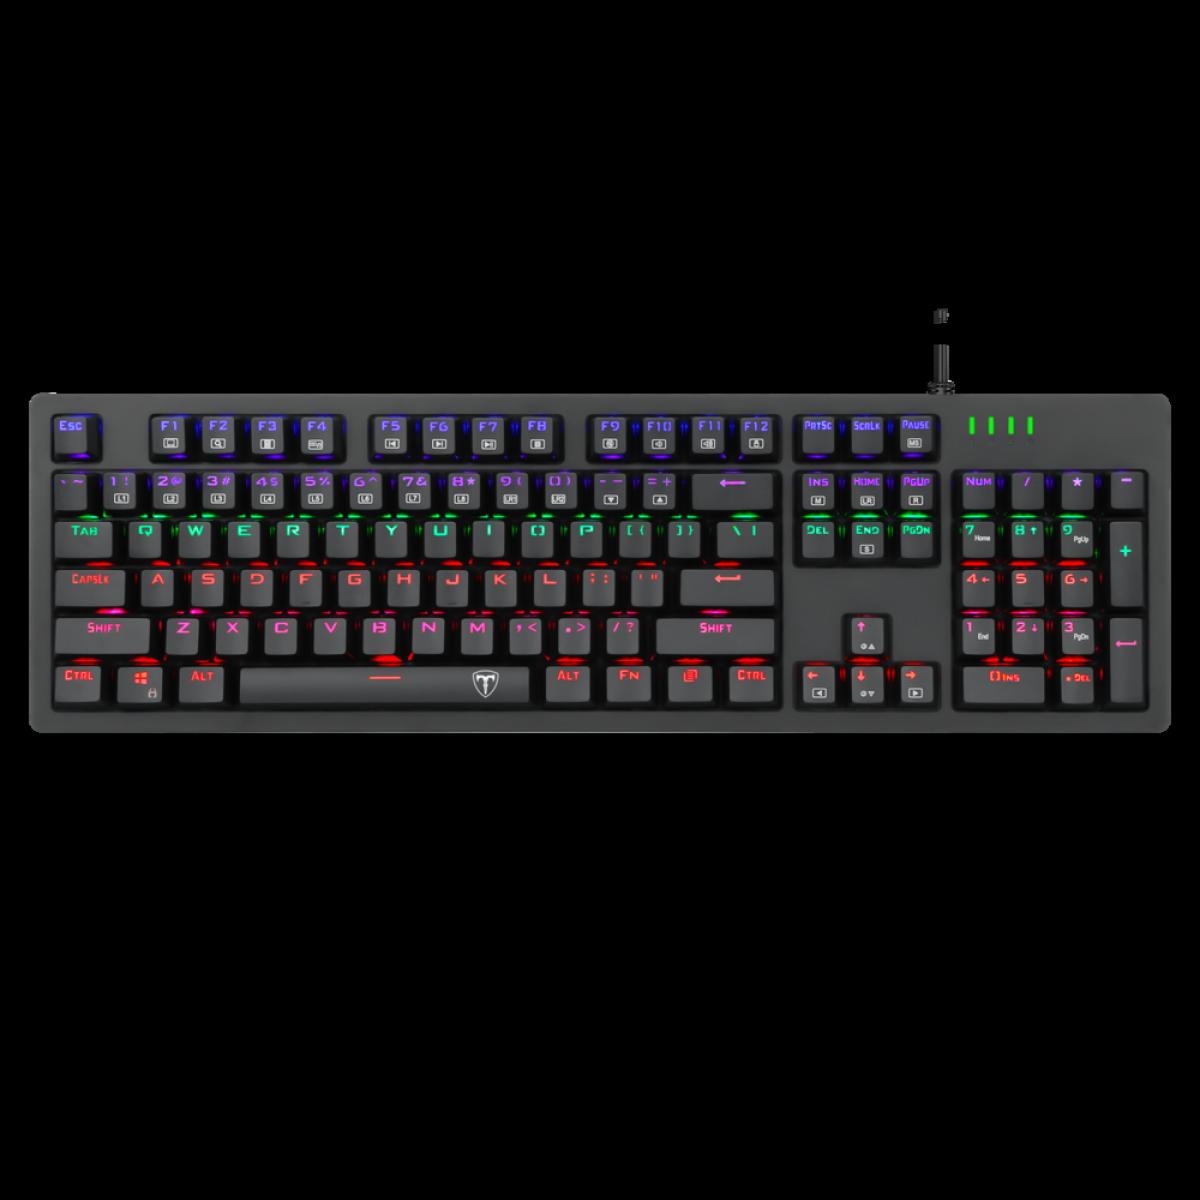 Teclado Gamer Mecânico T-Dagger Bermuda, RGB, Switch Red, Black, ABNT2, T-TGK312-RD